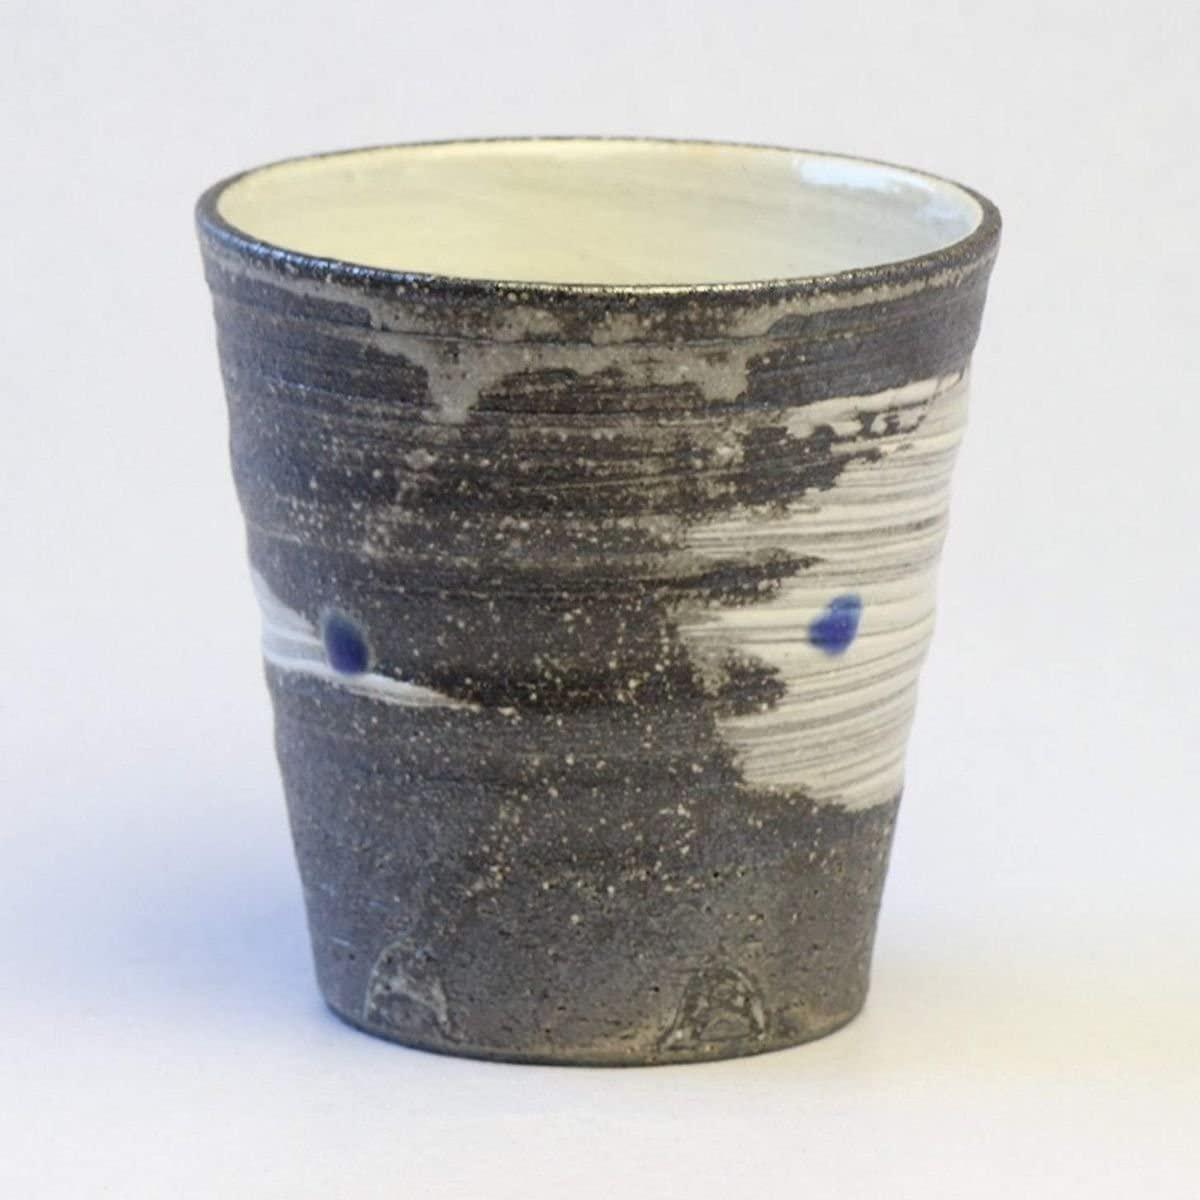 CtoC JAPAN Select 信楽焼 焼酎グラス 天の川(青) W919-07の商品画像2